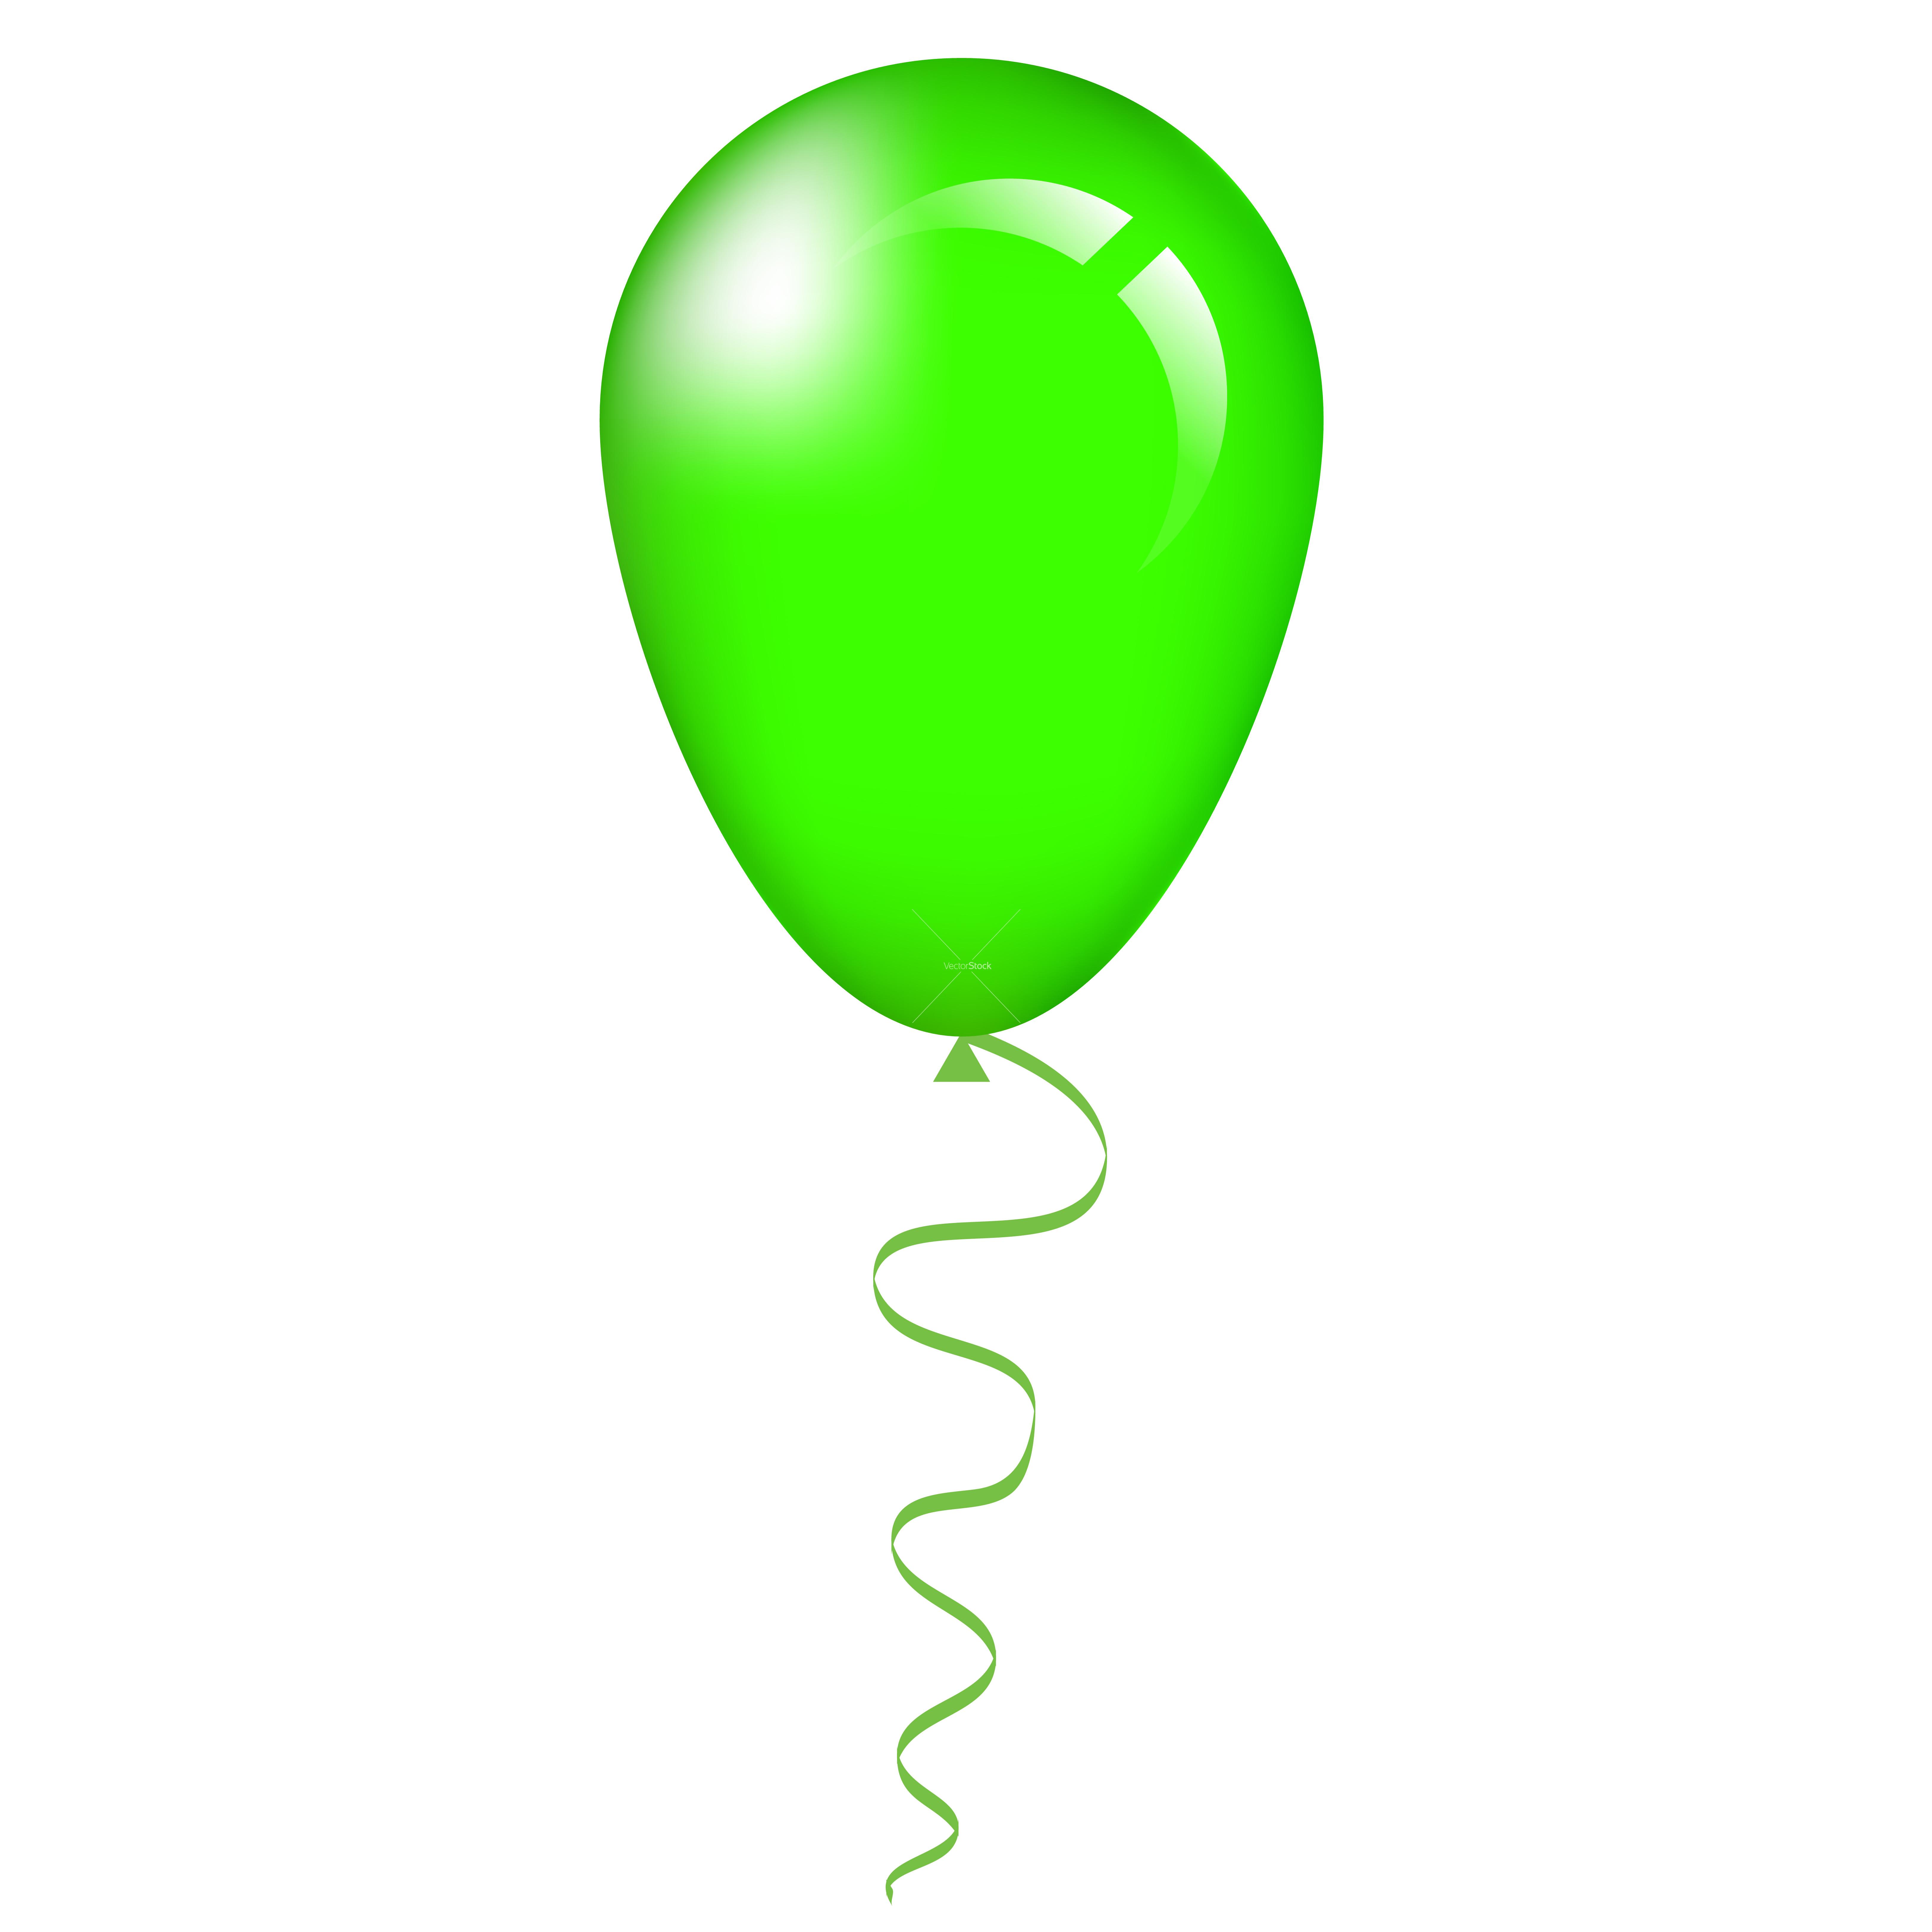 Clip art panda free. Balloon clipart single